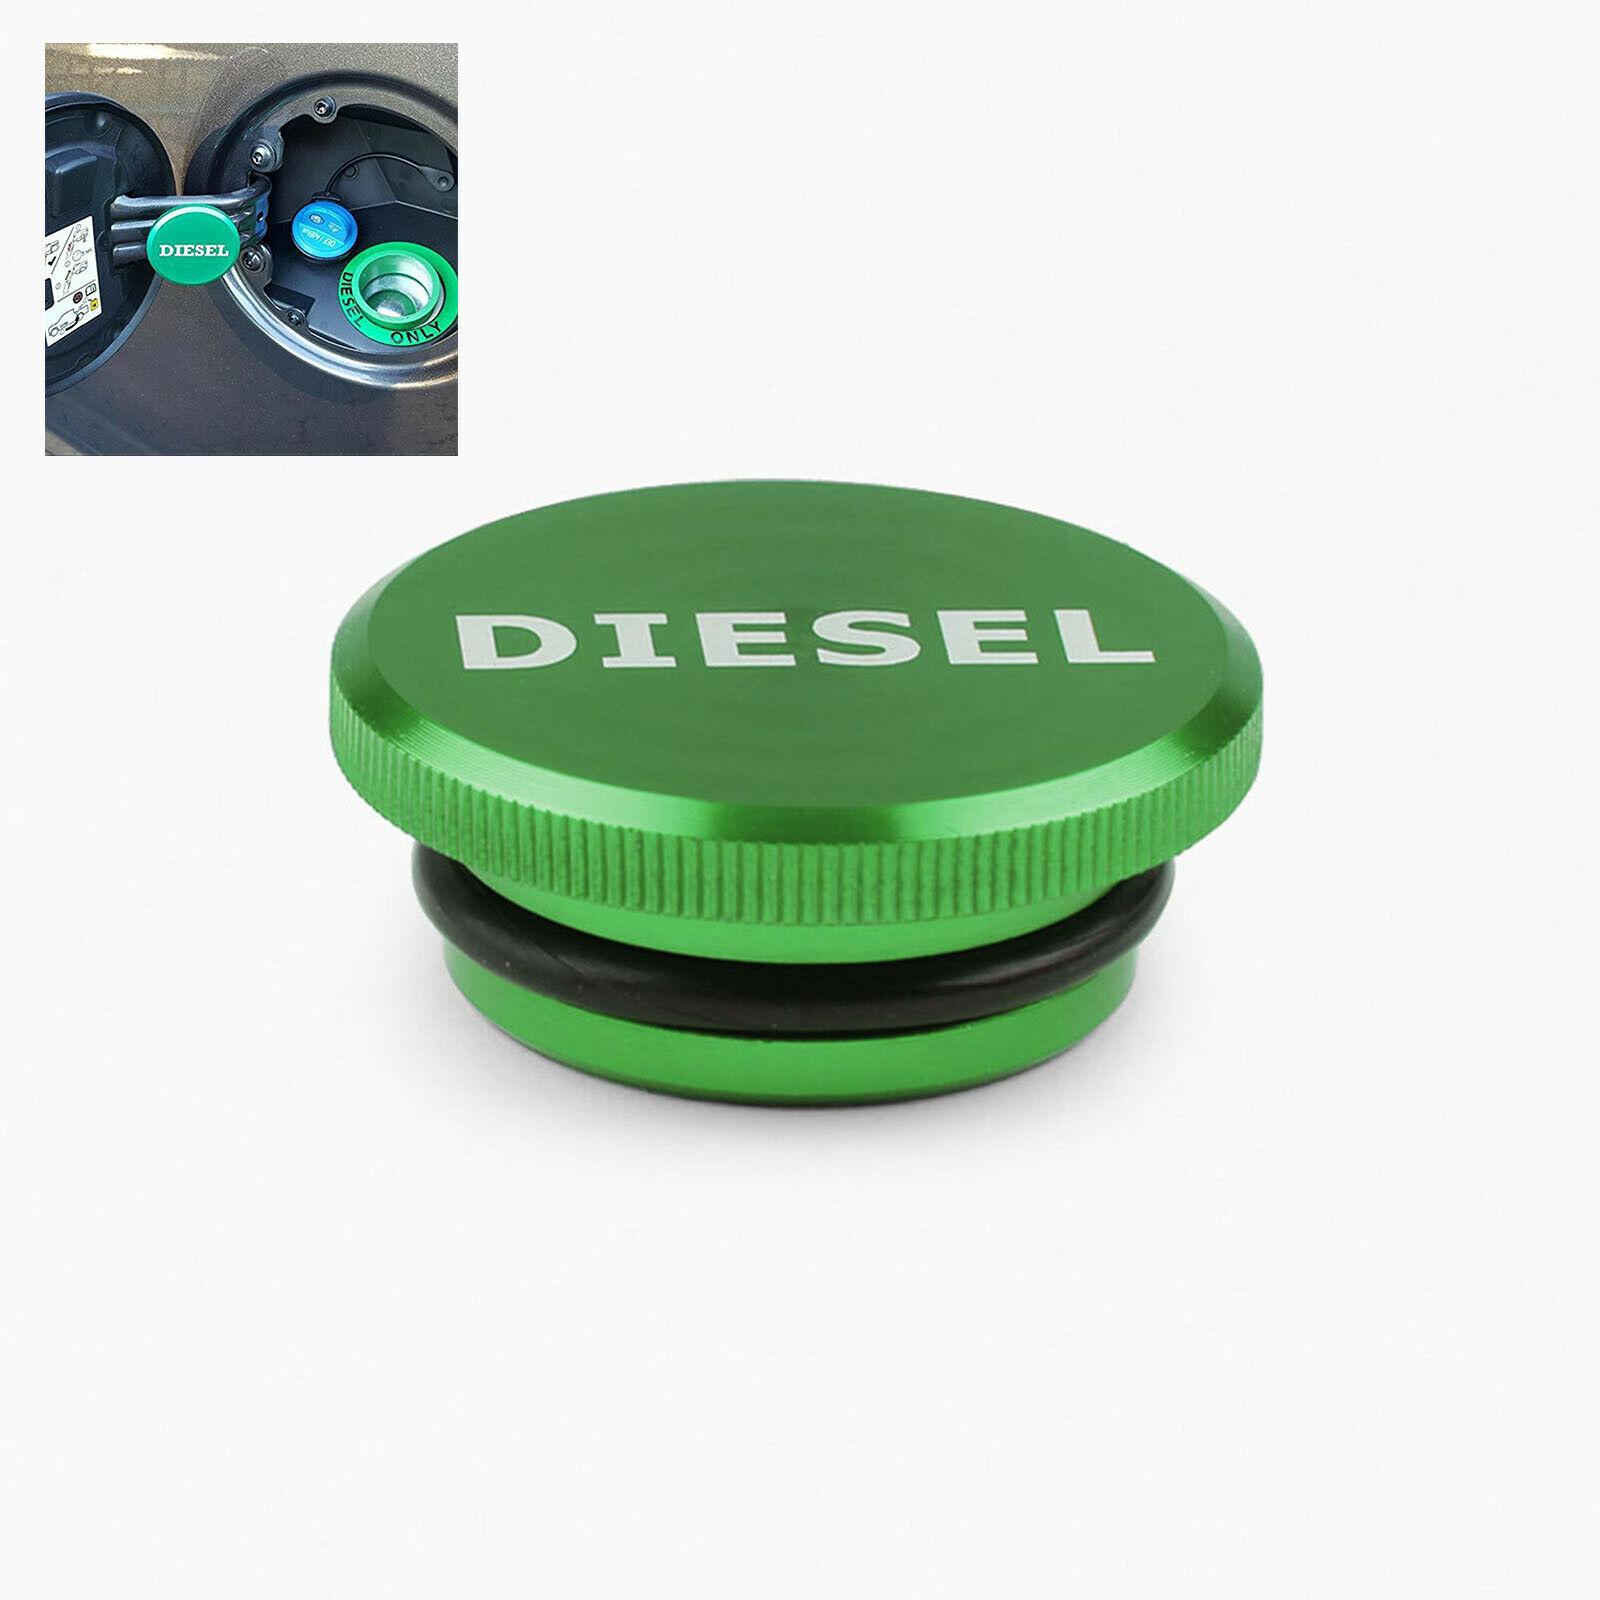 Buy Pouvoir Aluminum Magnetic Diesel Fuel Cap Accessory For Dodge Ram 2013-2018 13-18 for only 4.99 USD